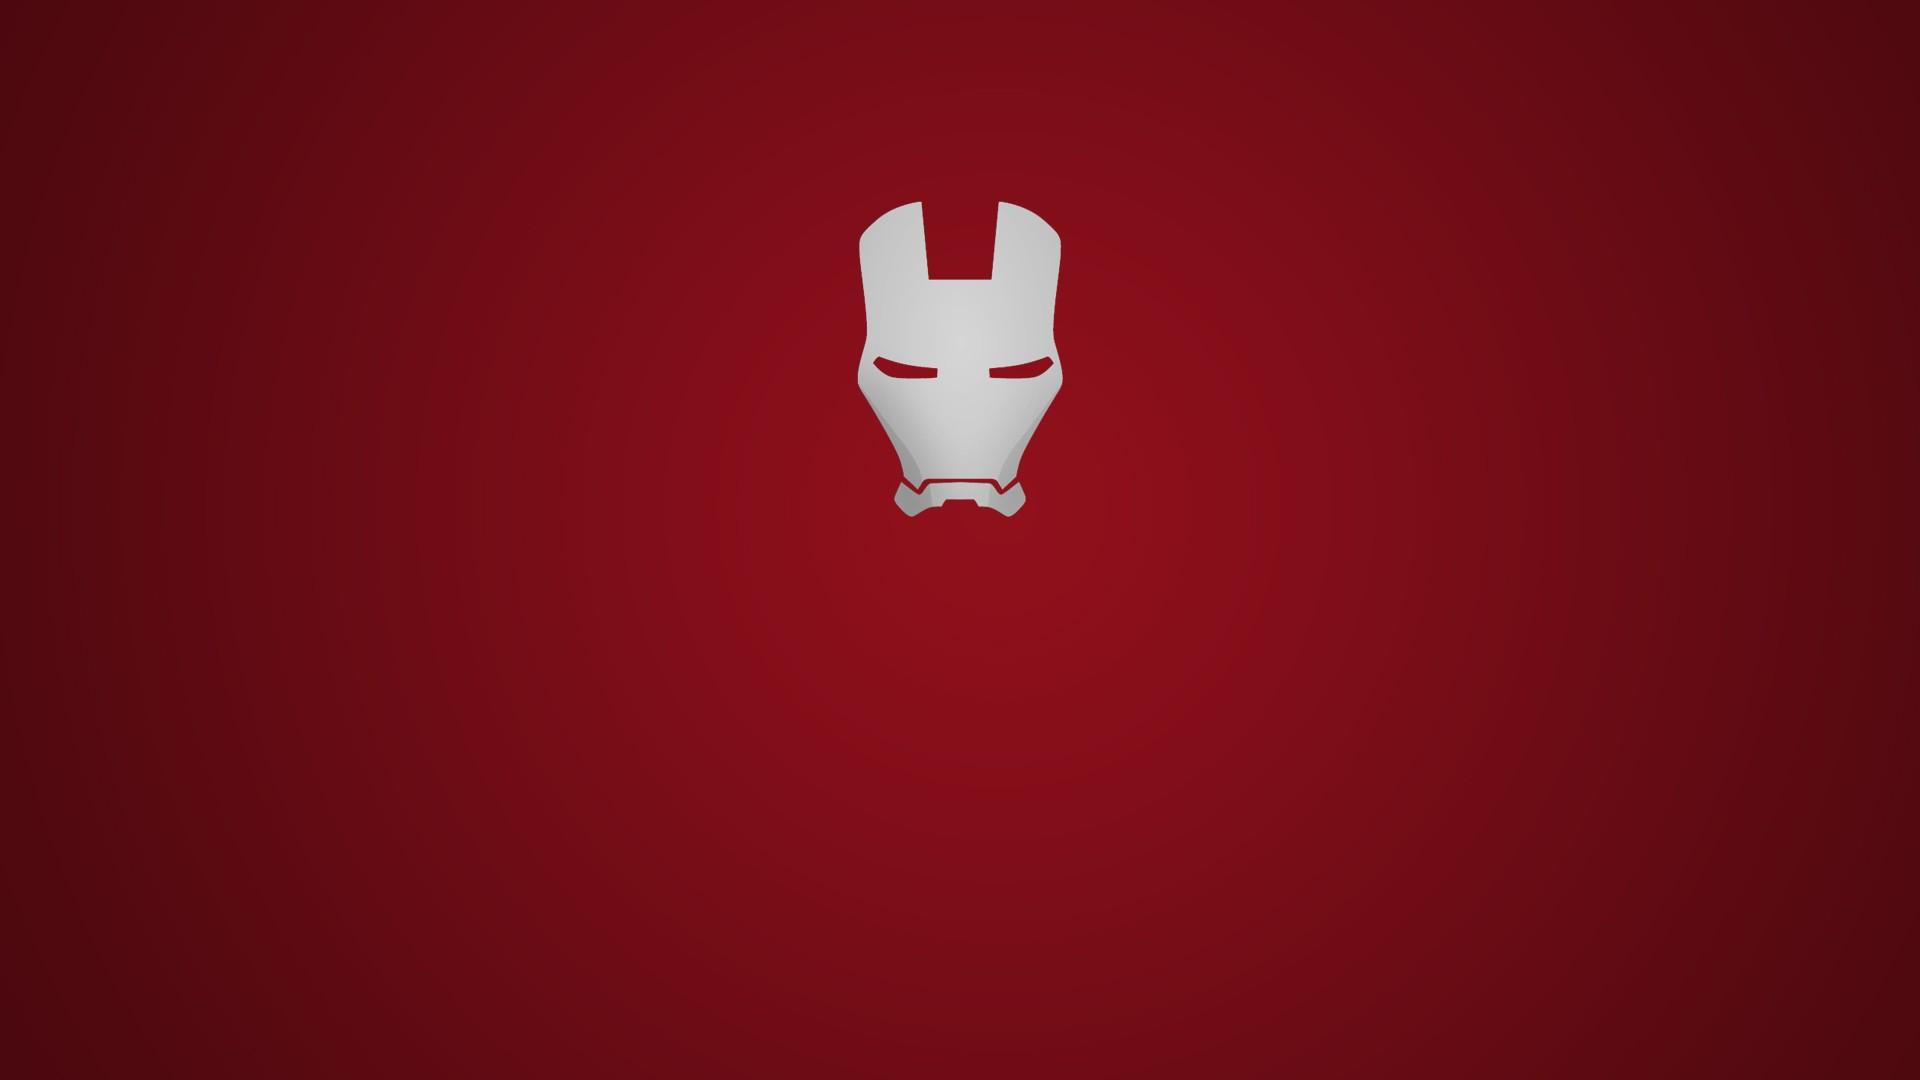 Illustration Red Logo Iron Man Light Hand Finger Darkness Computer Wallpaper